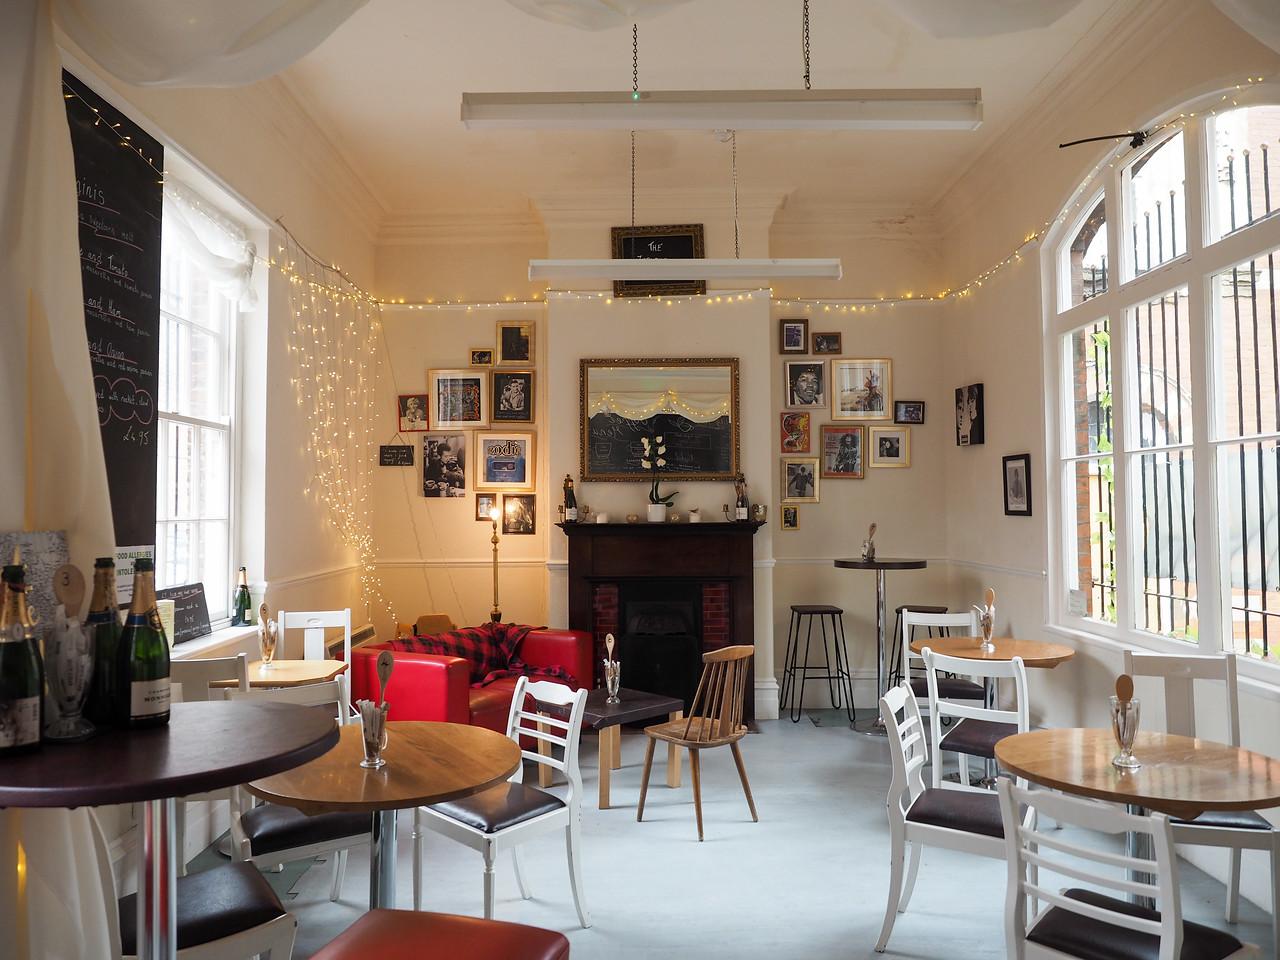 Liquid Jade cafe in Hull, England